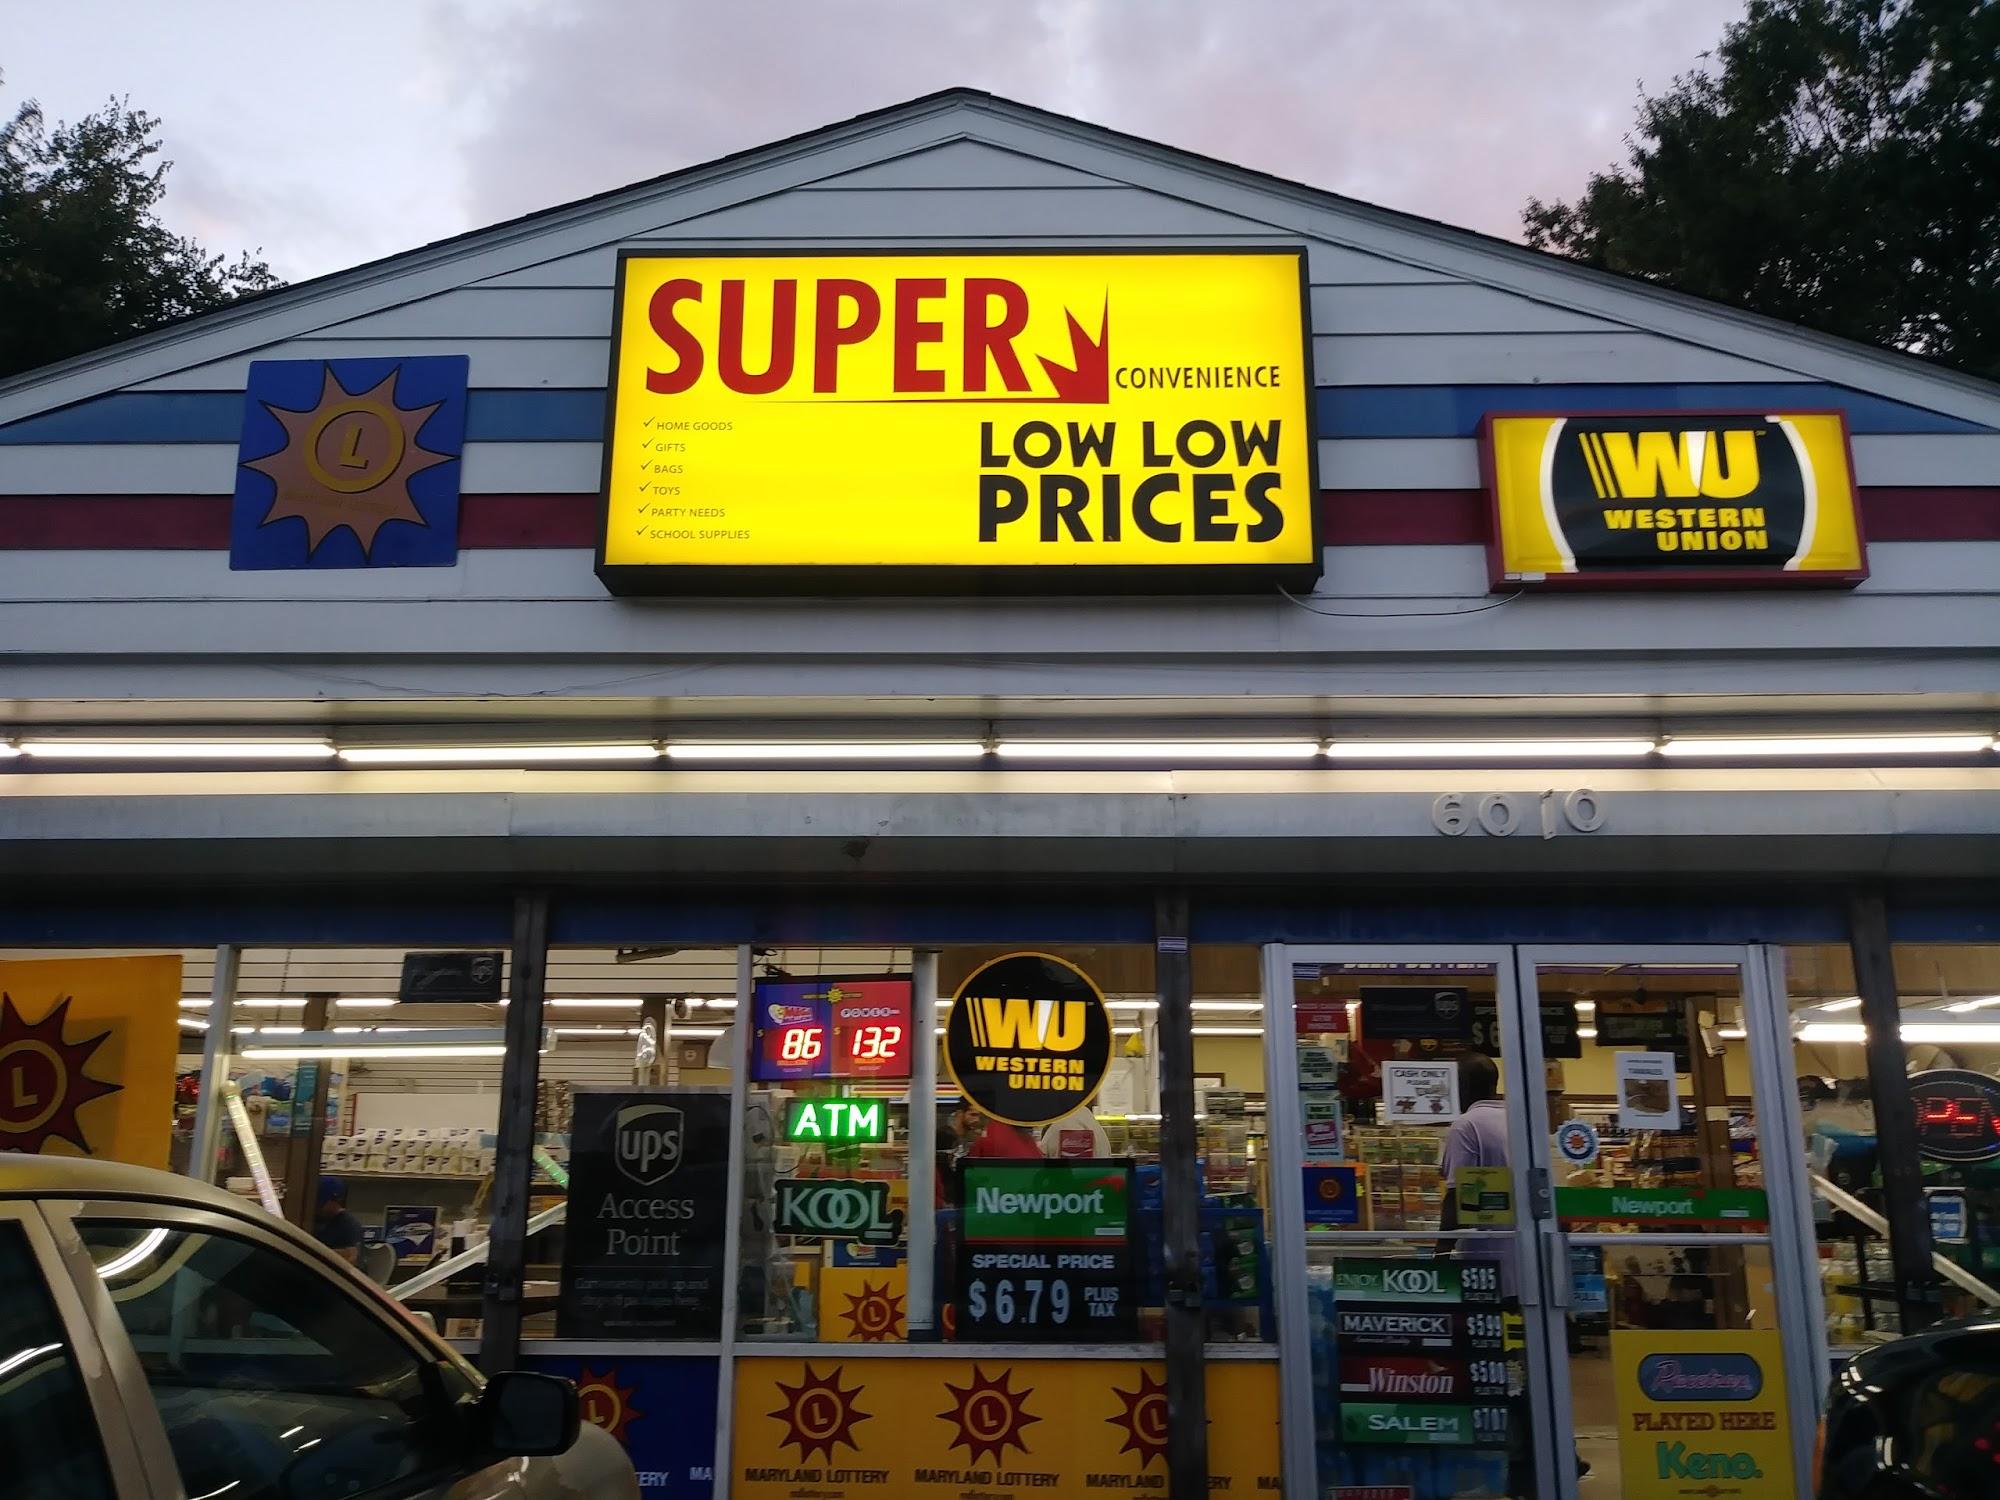 Super Convenience Store